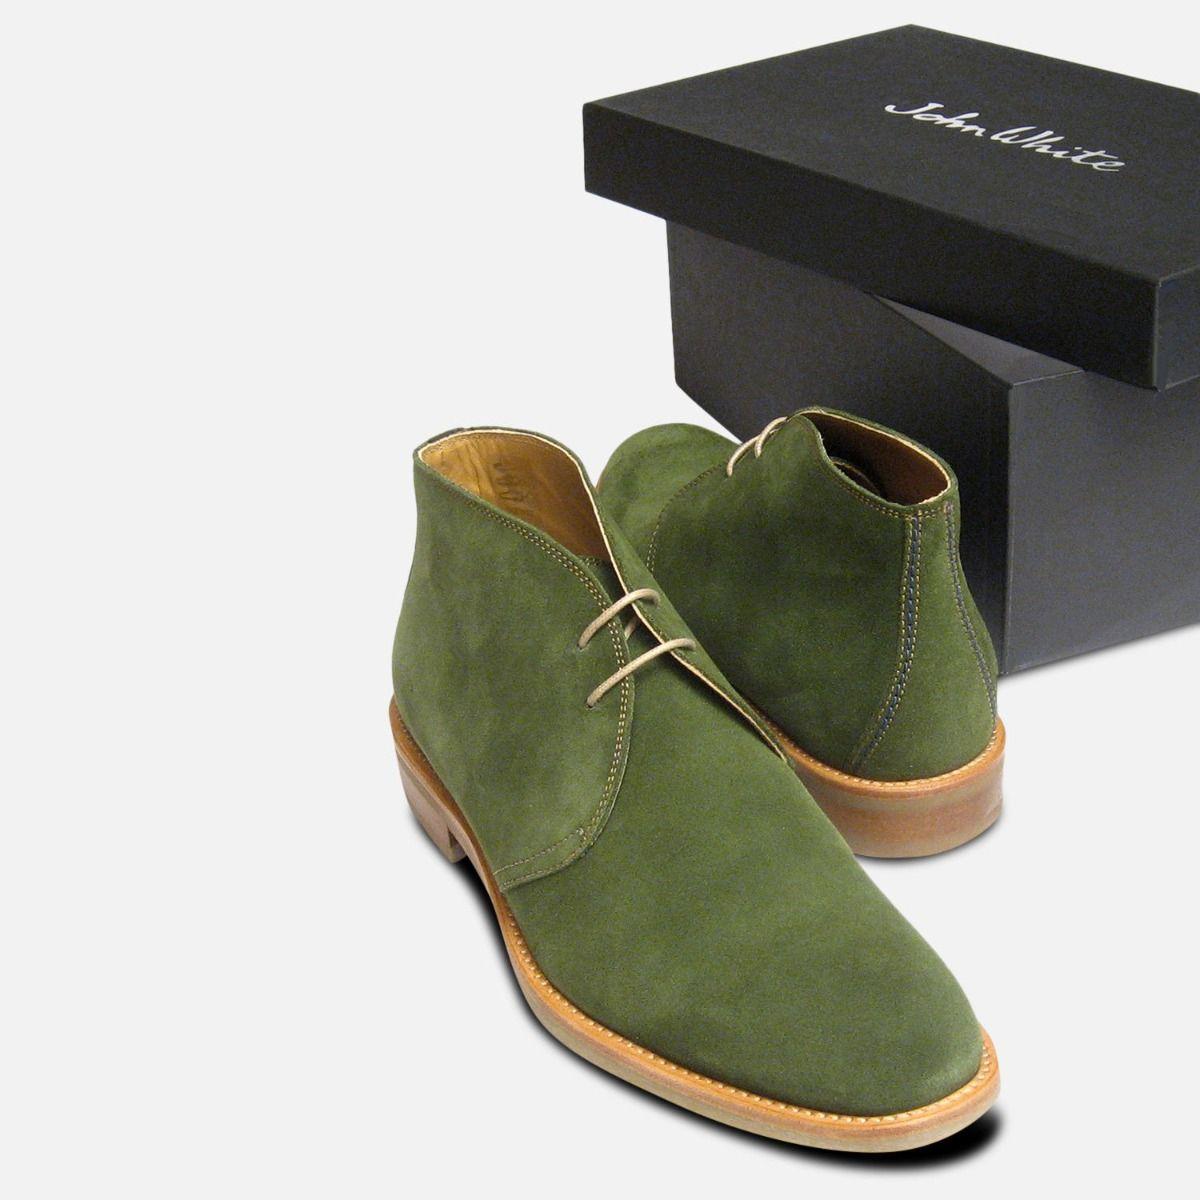 John White Westbury 4 Mens Green Suede Chukka Boots